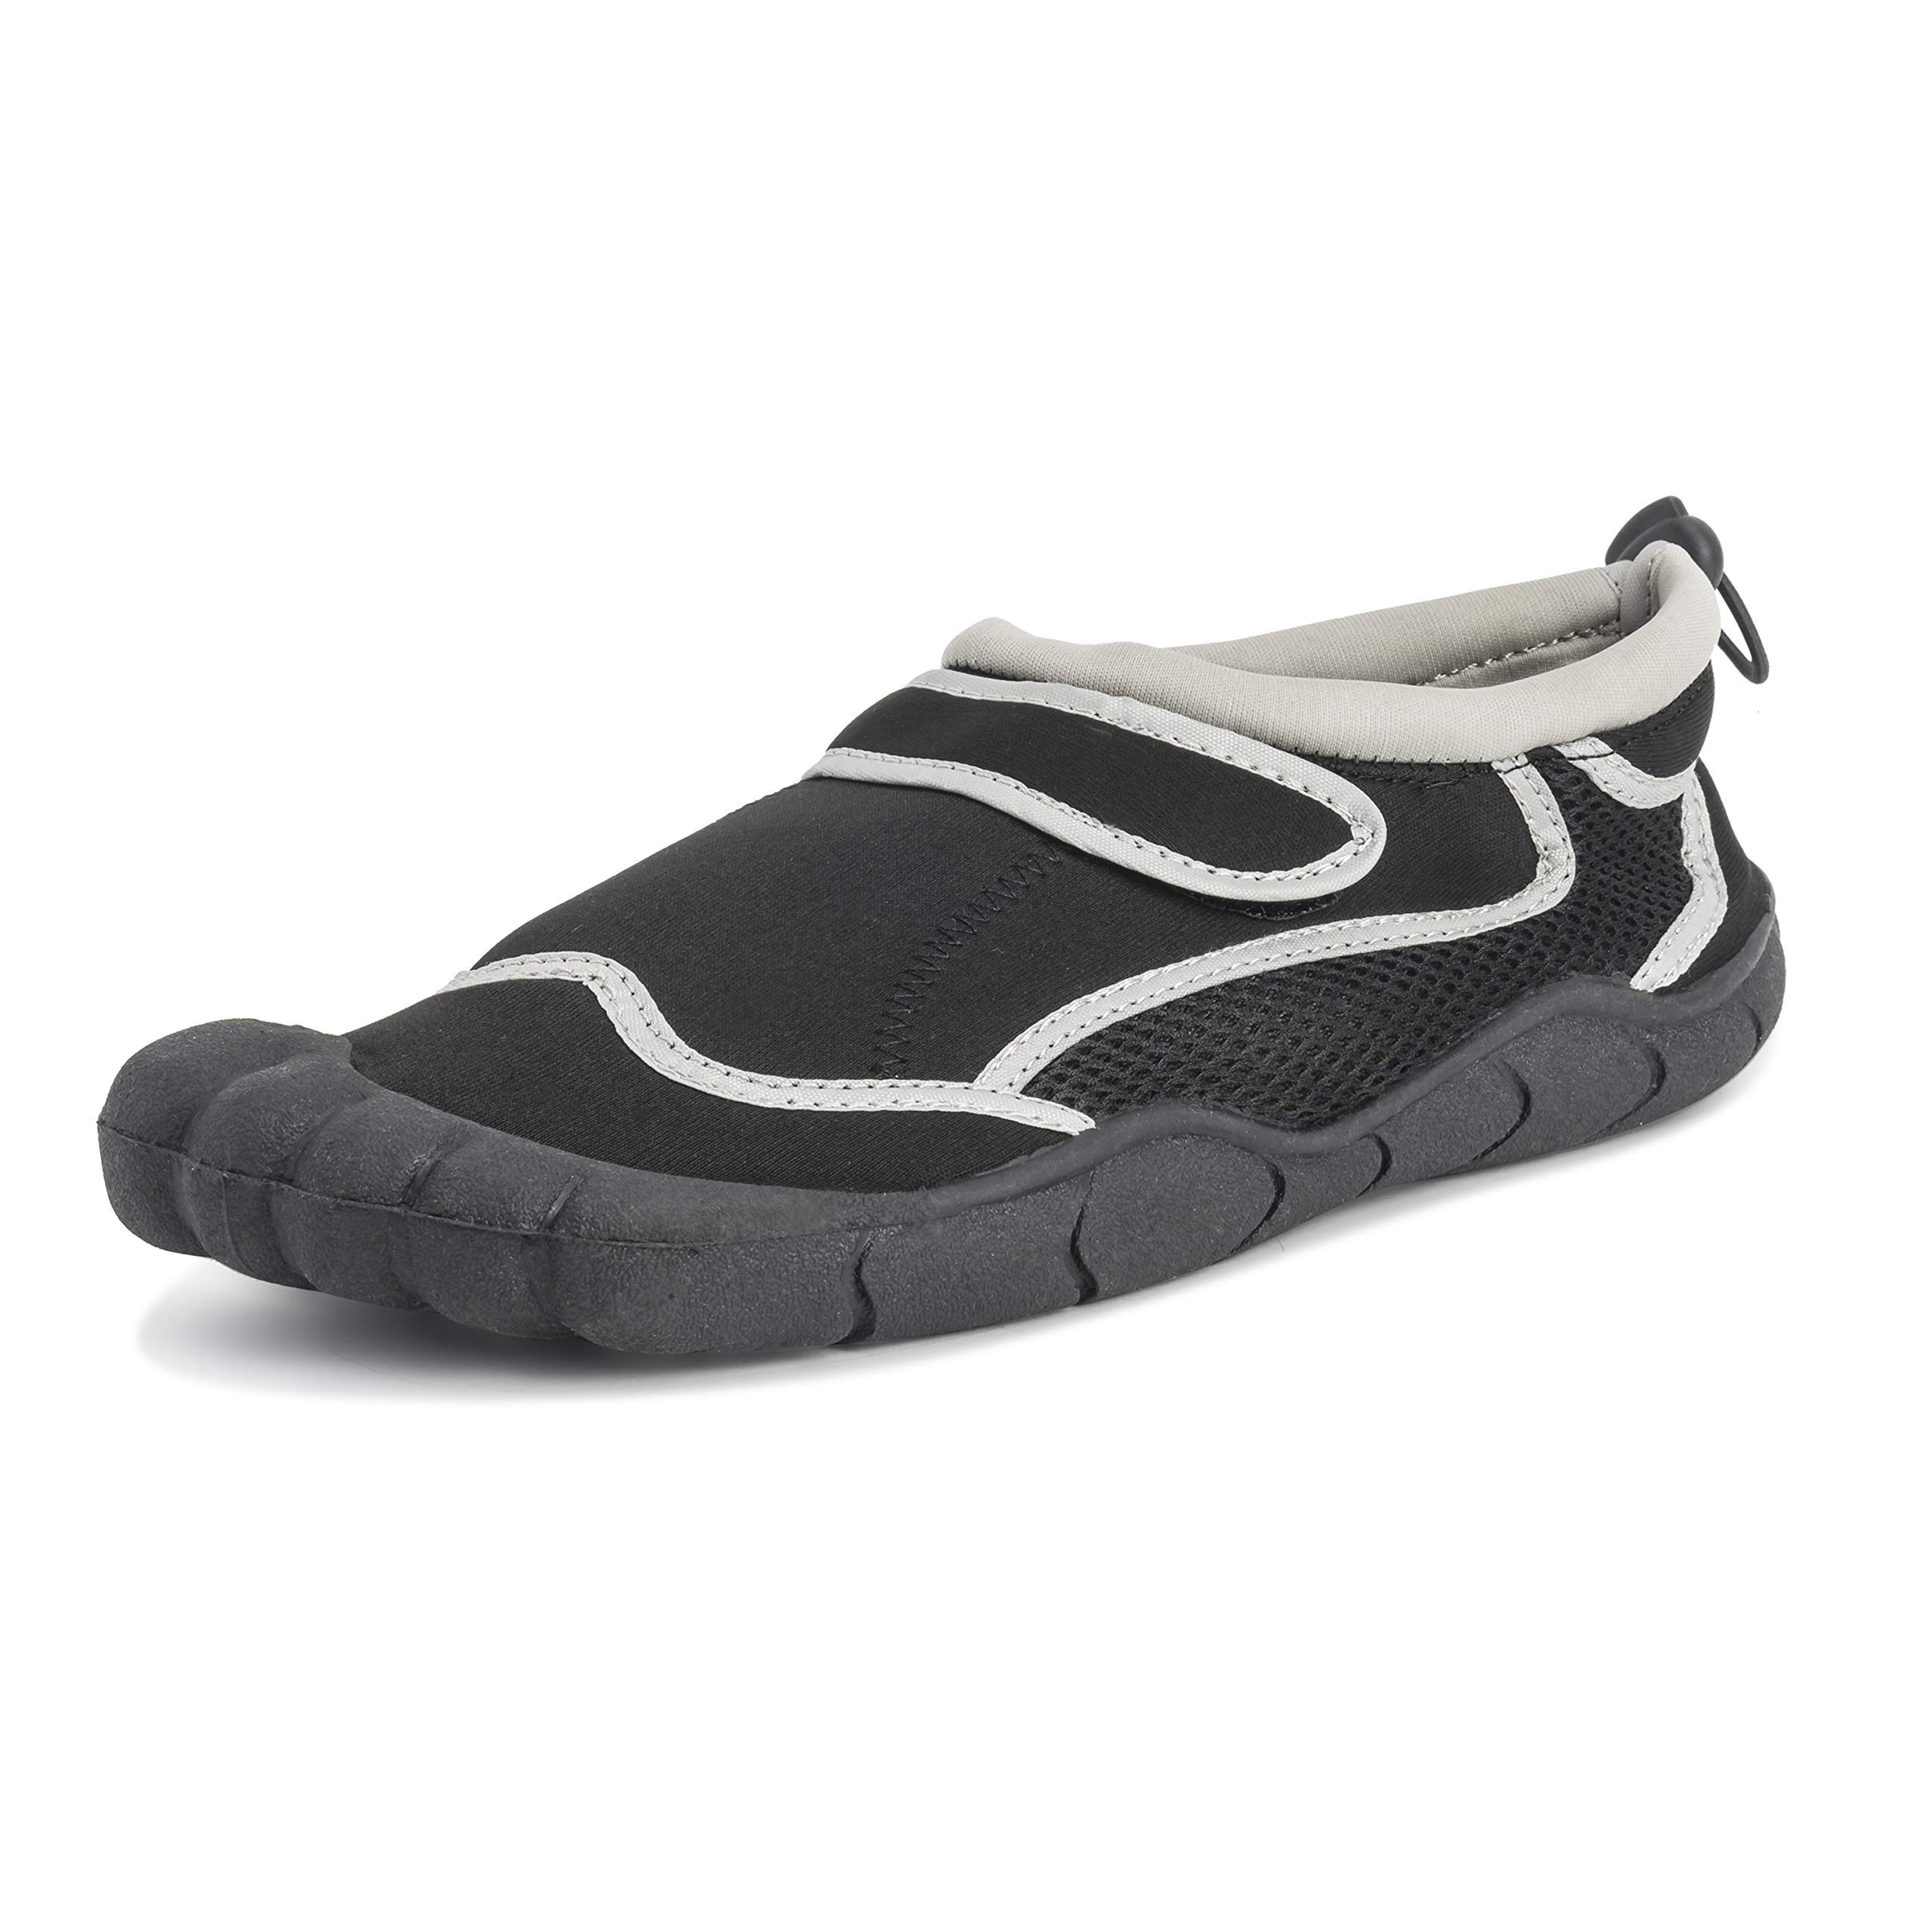 UK 10 // EU 44, Grey with Black Trim Wetsuit Shoes Nalu Hook and Loop Aqua Surf//Beach